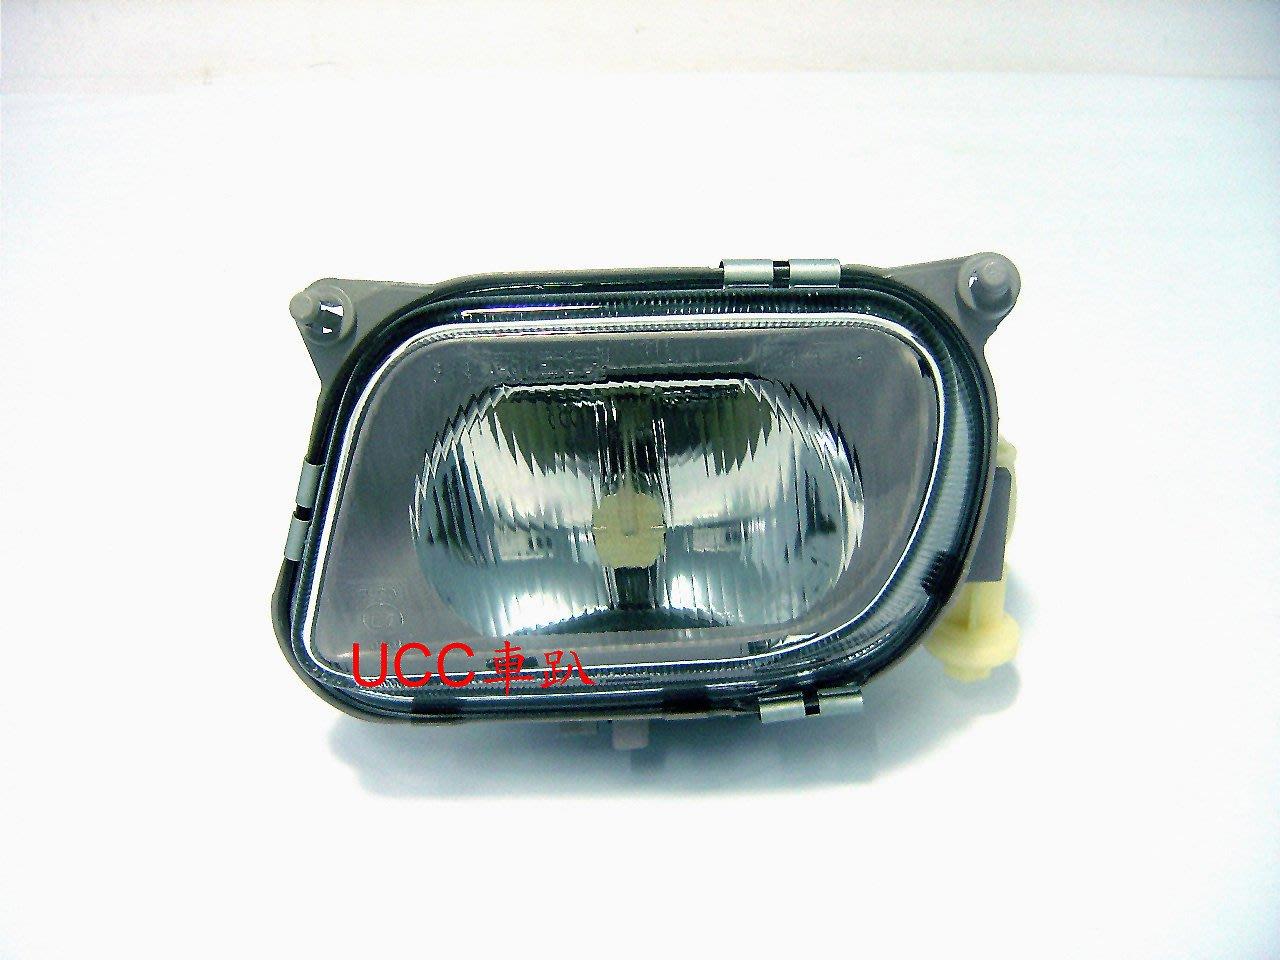 【UCC車趴】BENZ 賓士 W210 96 97-99 原廠型 玻璃霧燈 一組2800